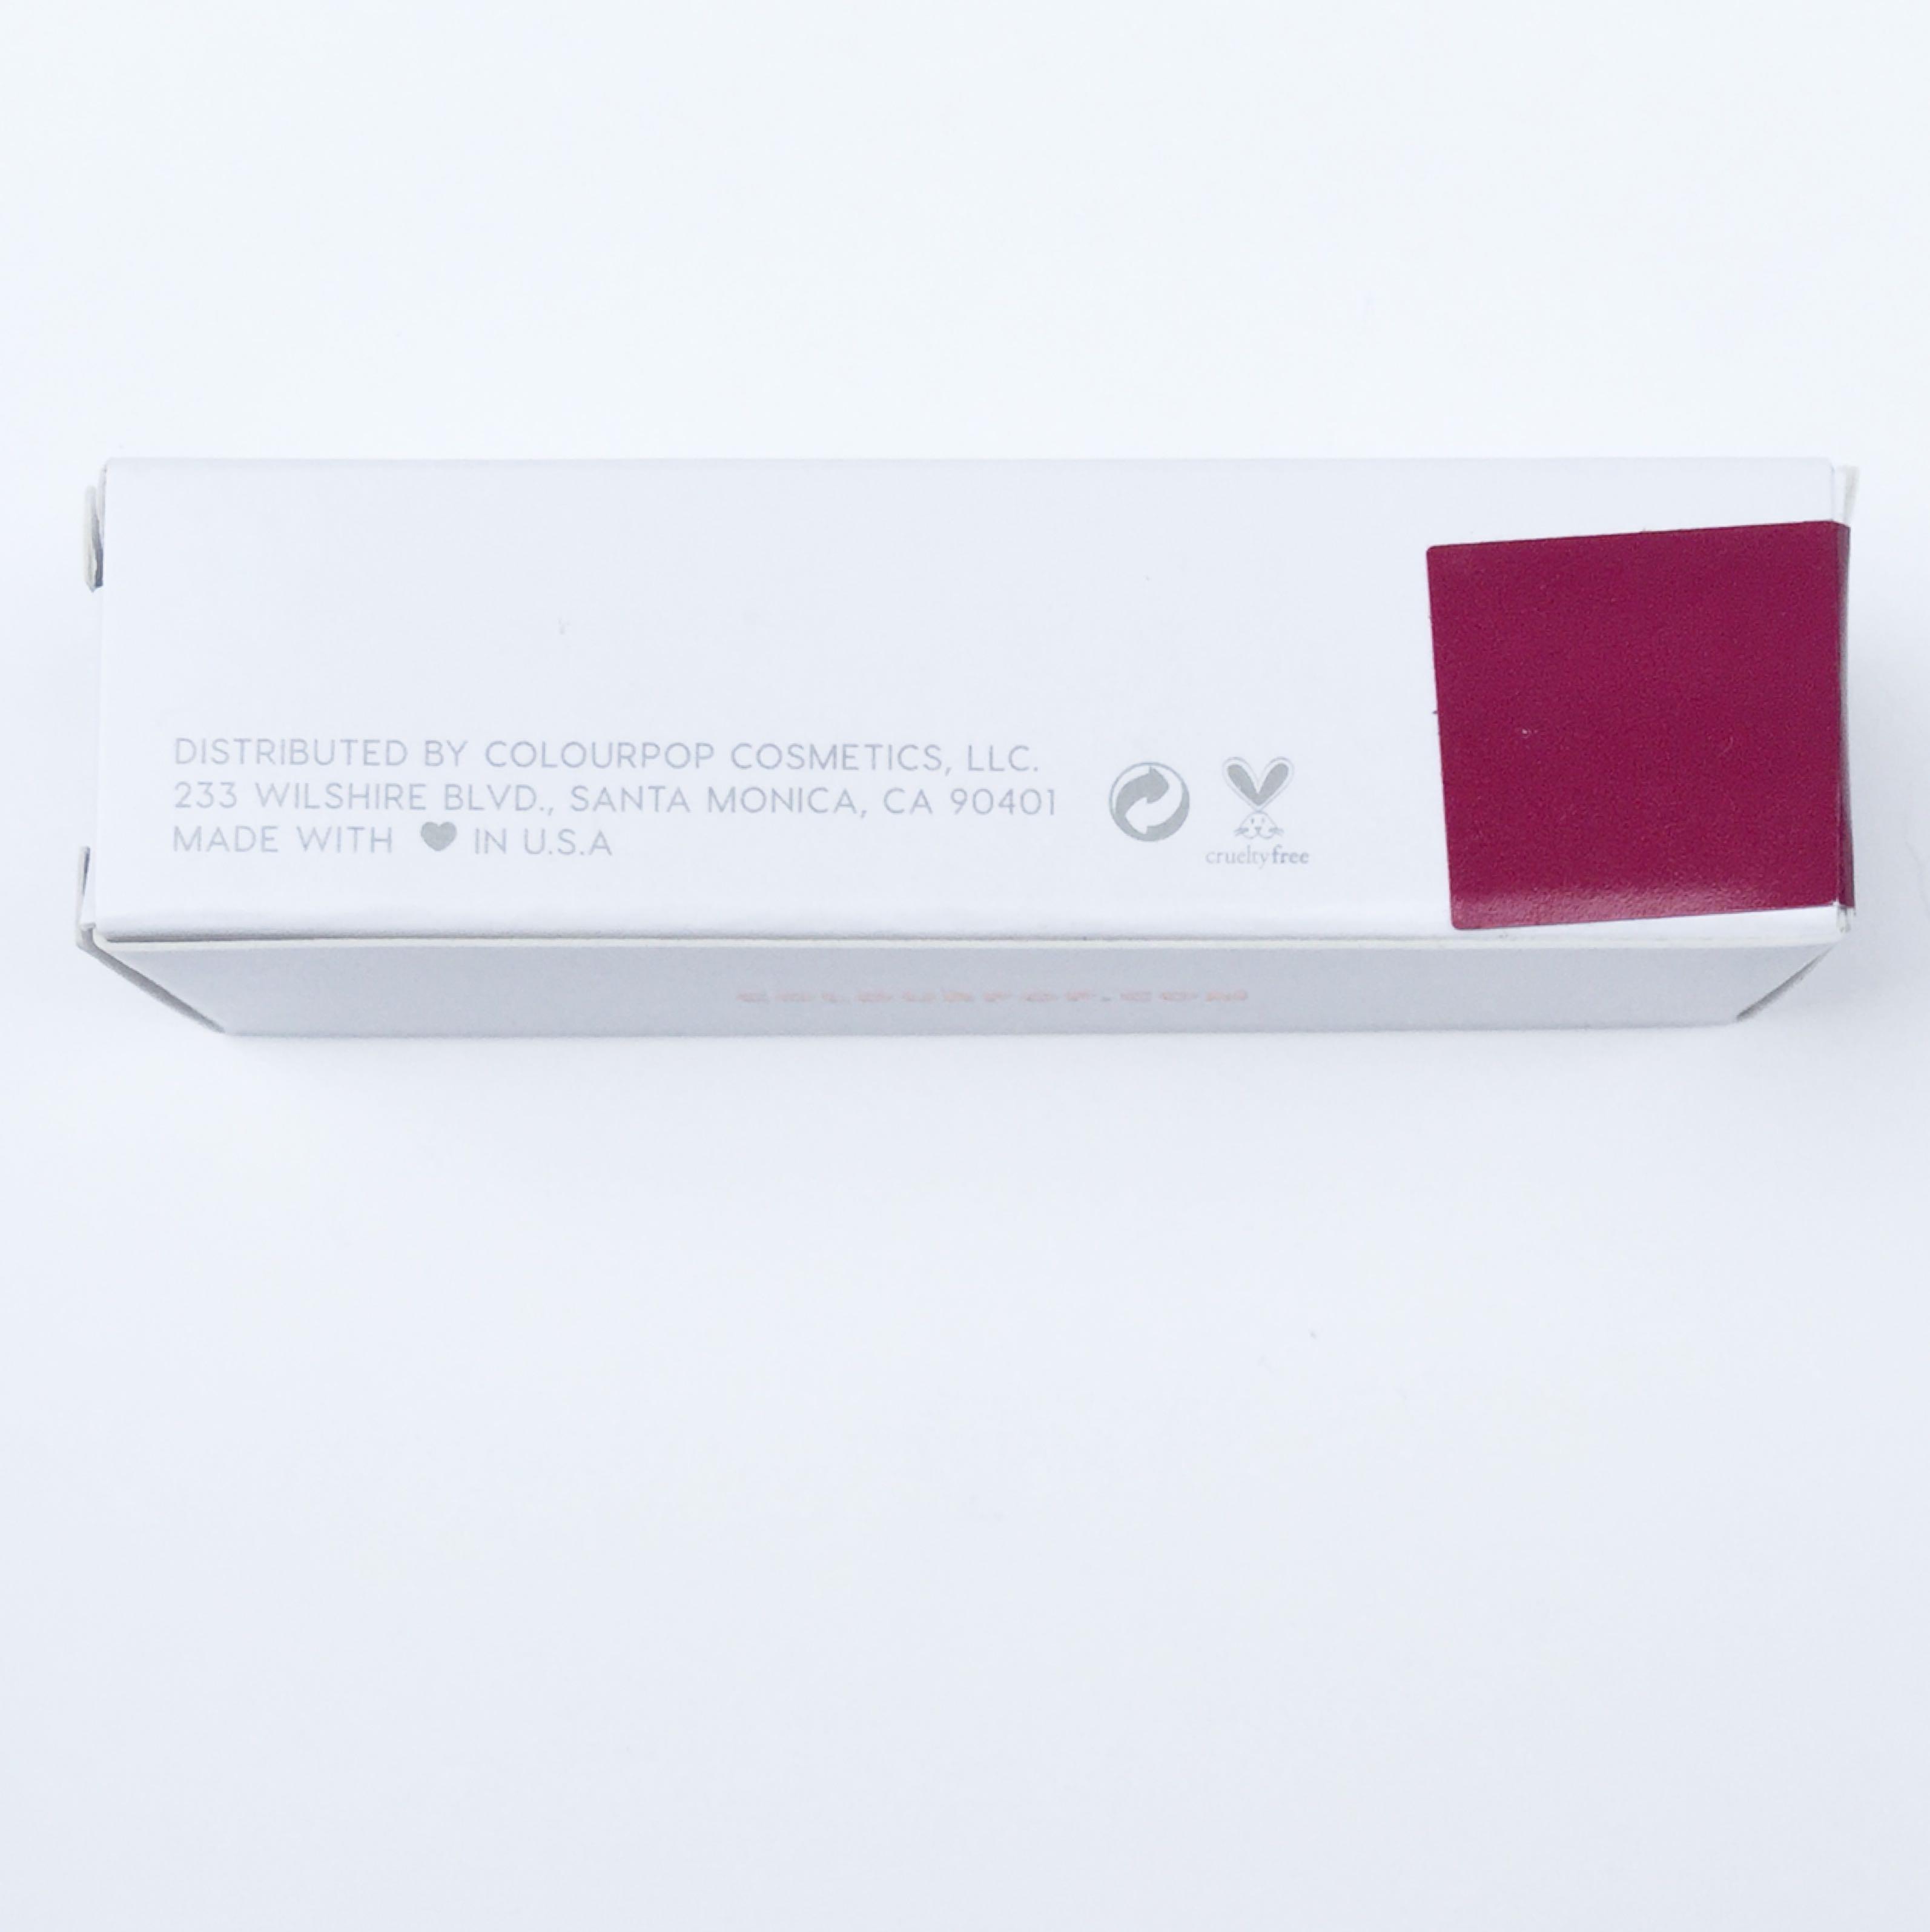 Brand New - ColourPop LUX Lipstick - Hello Stranger ❤️ AUTHENTIC